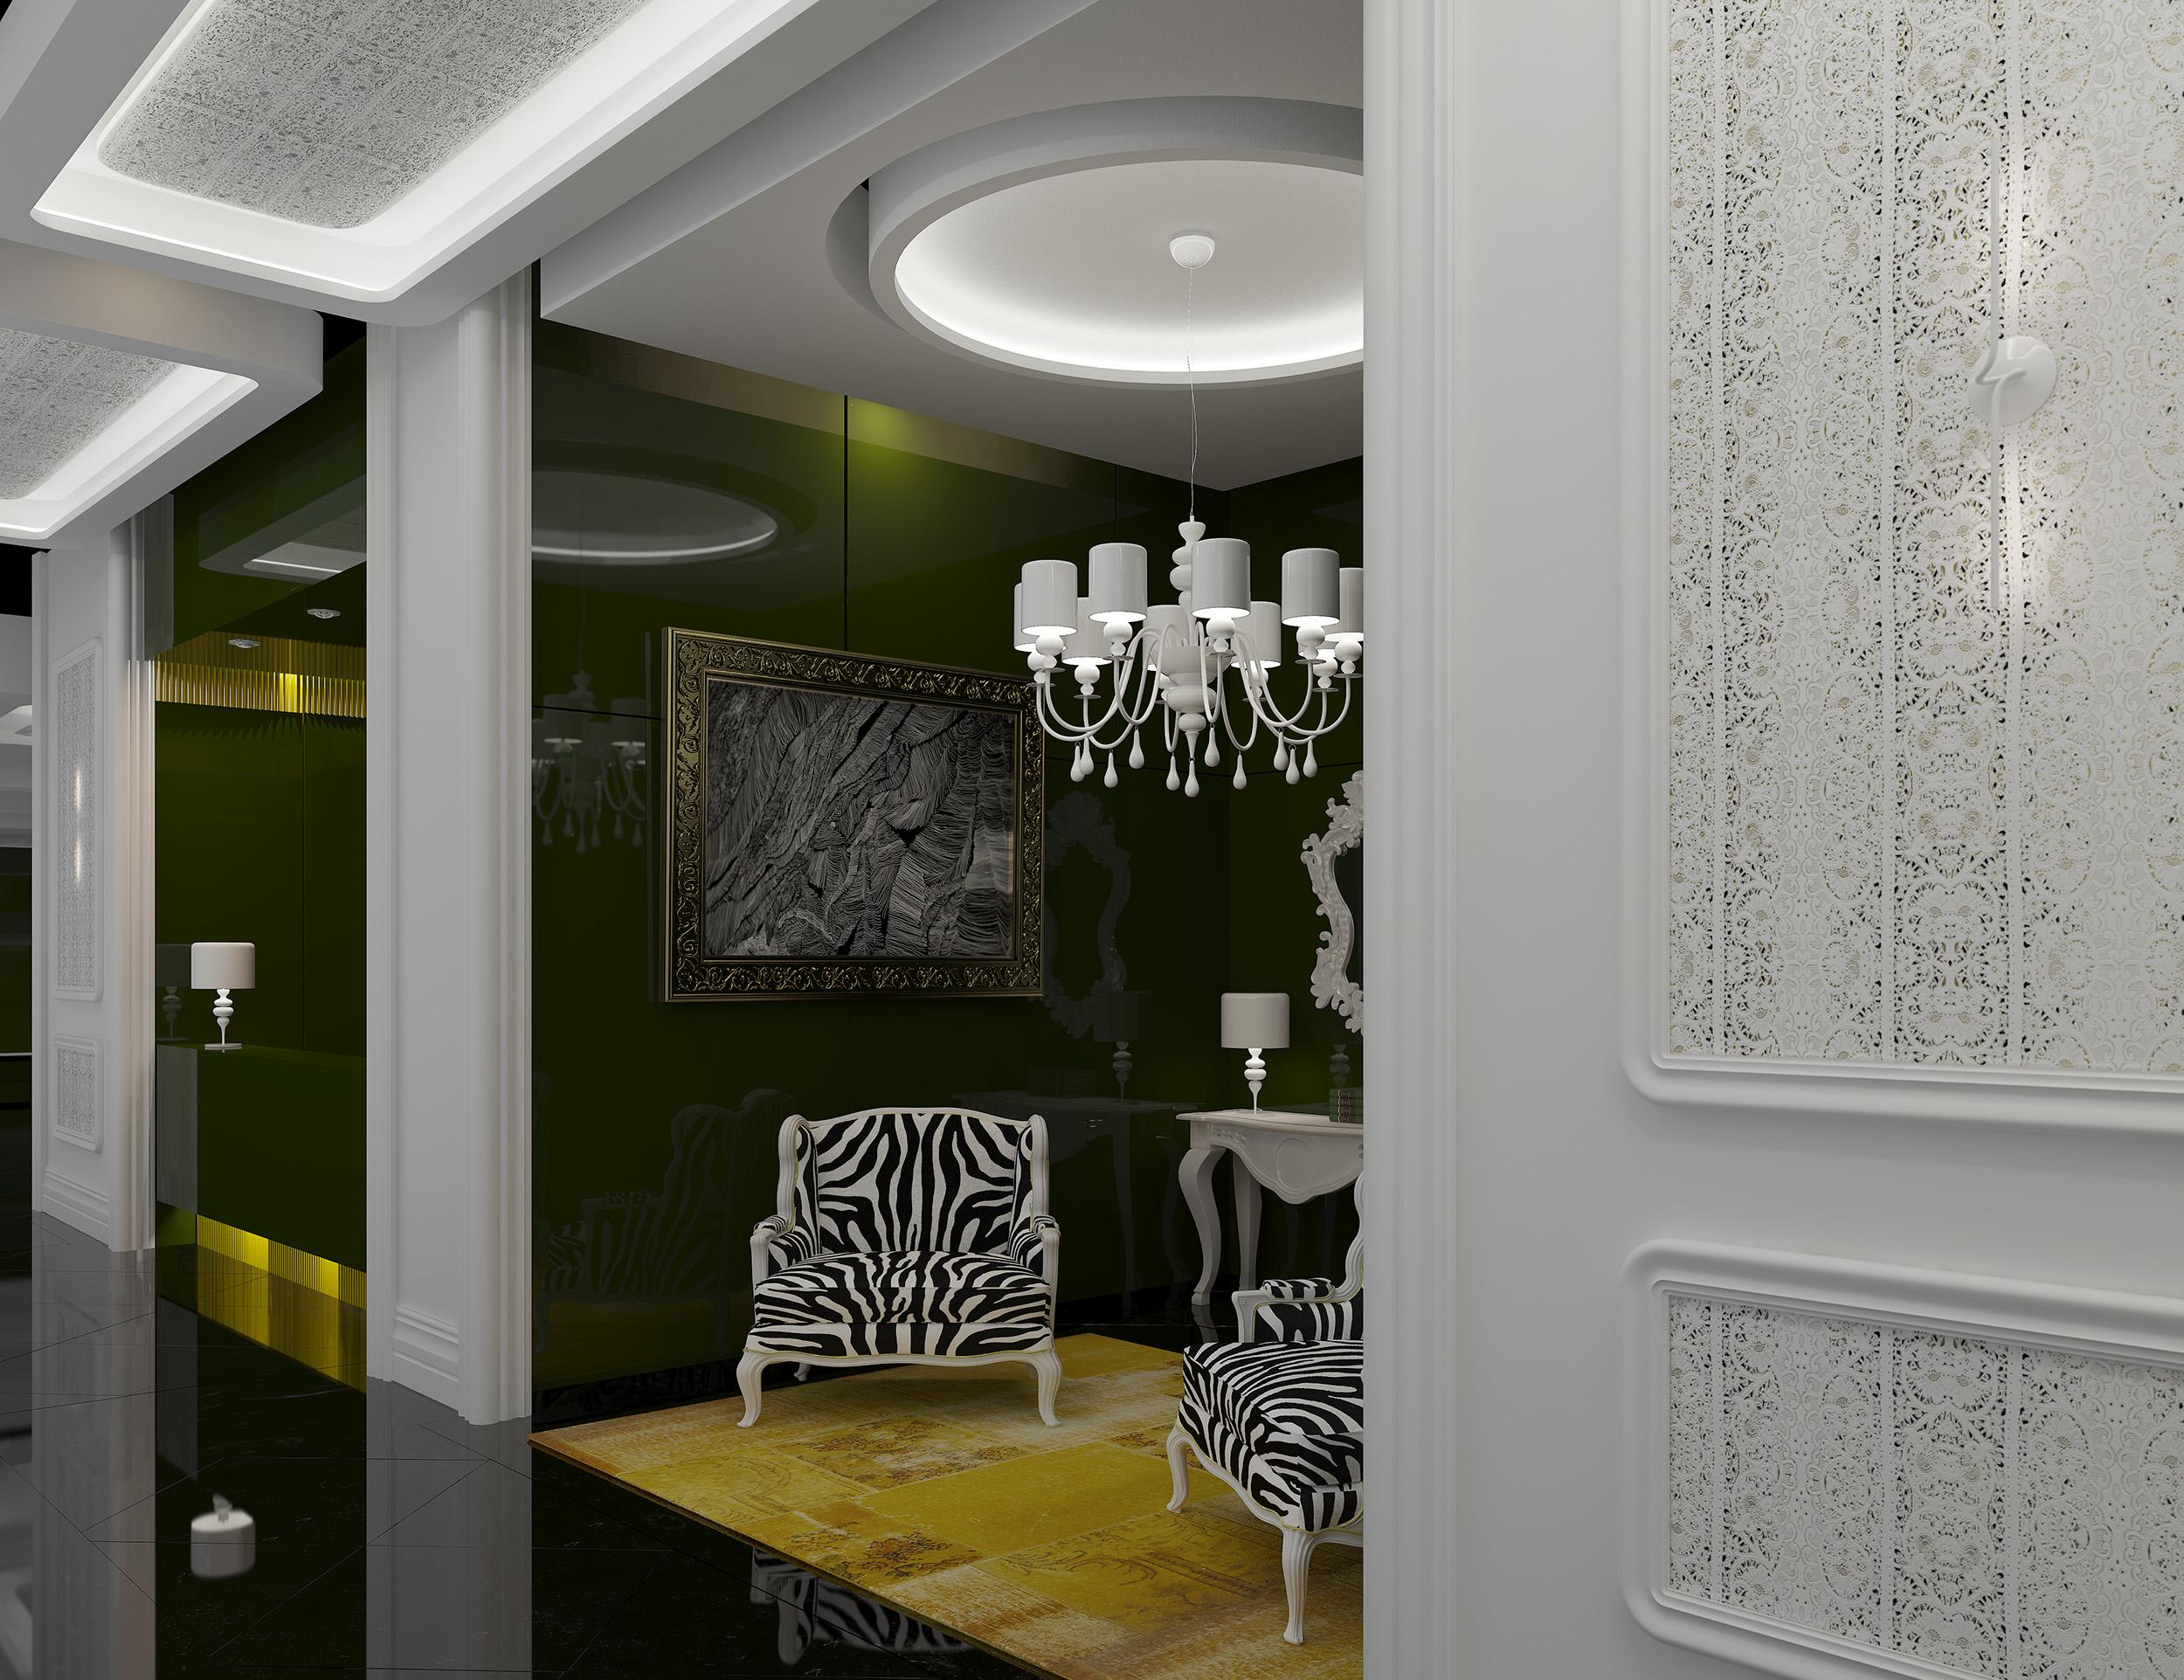 misterestudio-presidential lounge hotel ethiopia Recepcion